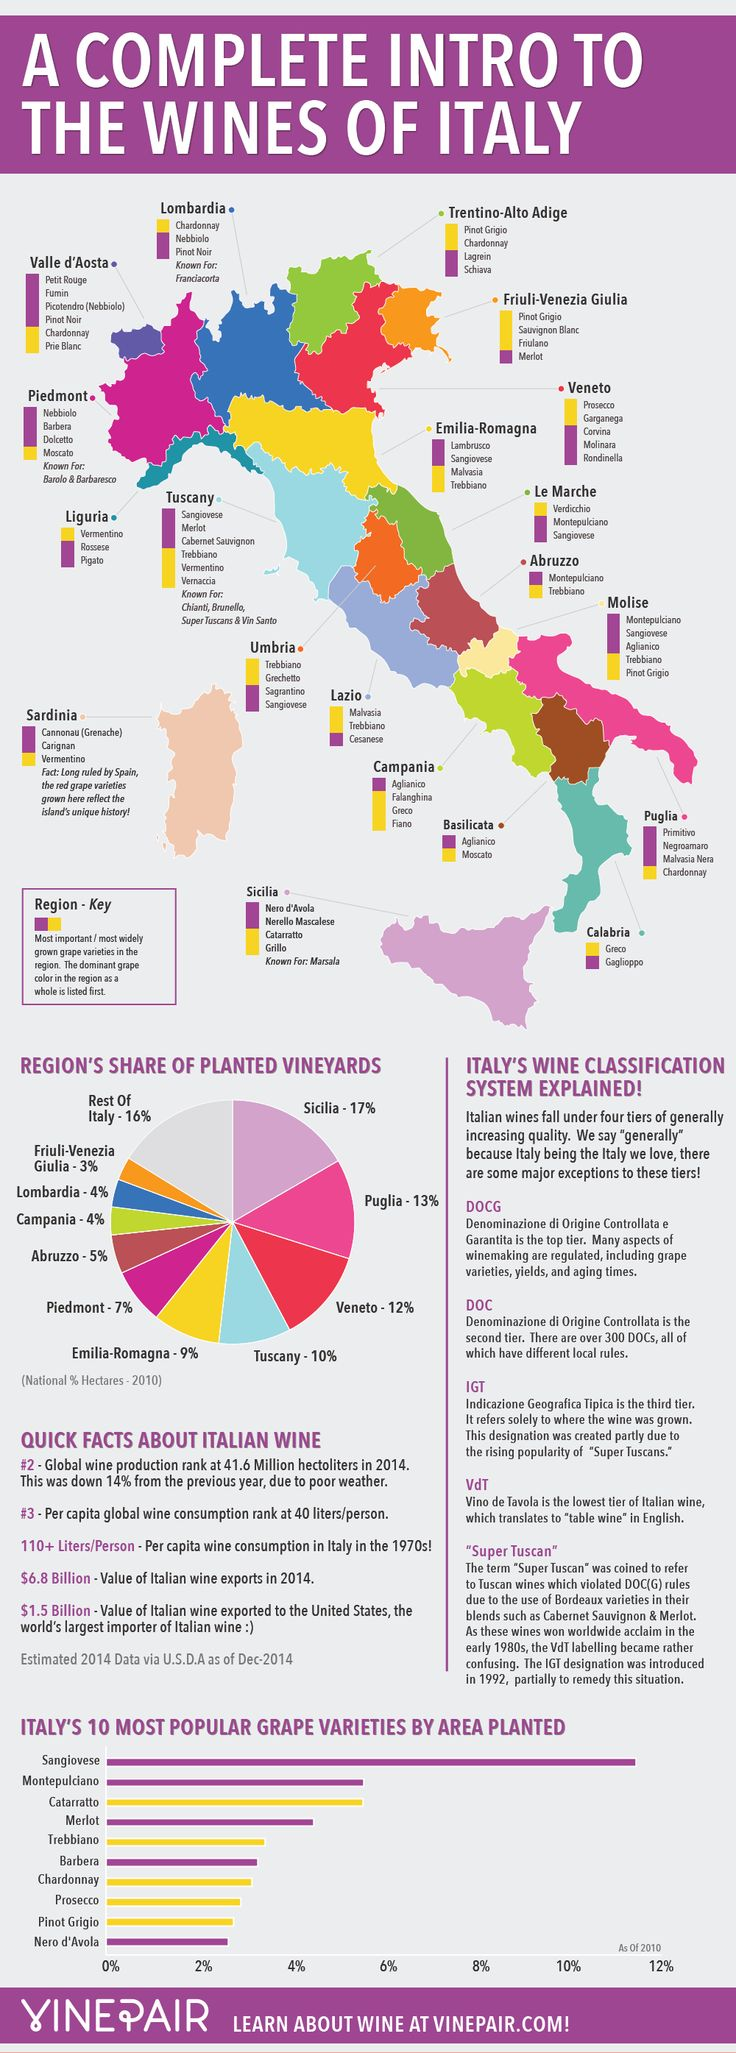 Afbeelding van https://franklinliquors.files.wordpress.com/2015/01/12-intro-italy-wine-guide-infographic-franklin-liquors.png.